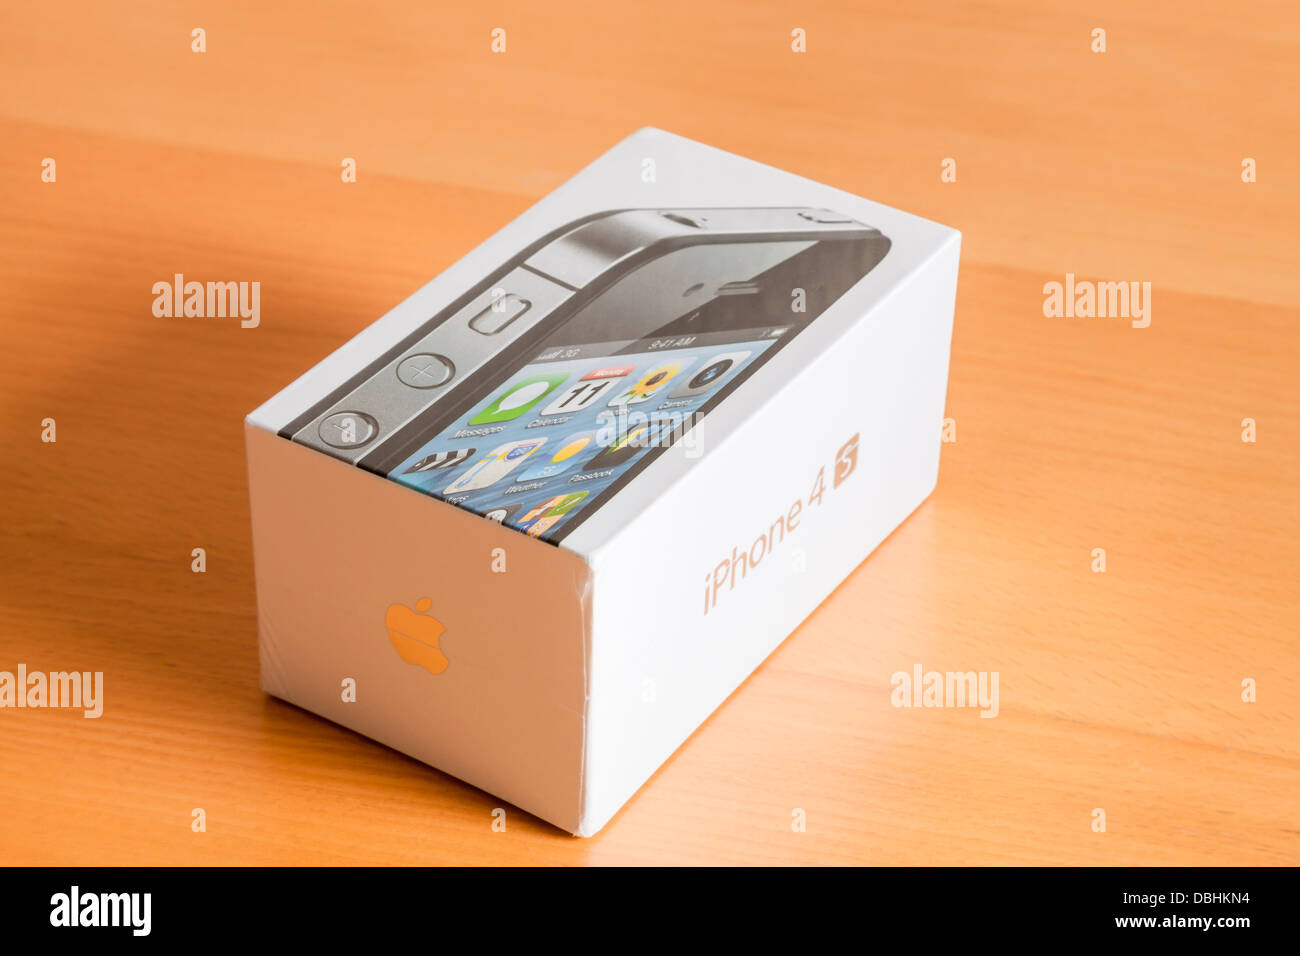 Unopened new iPhone 4s - Stock Image